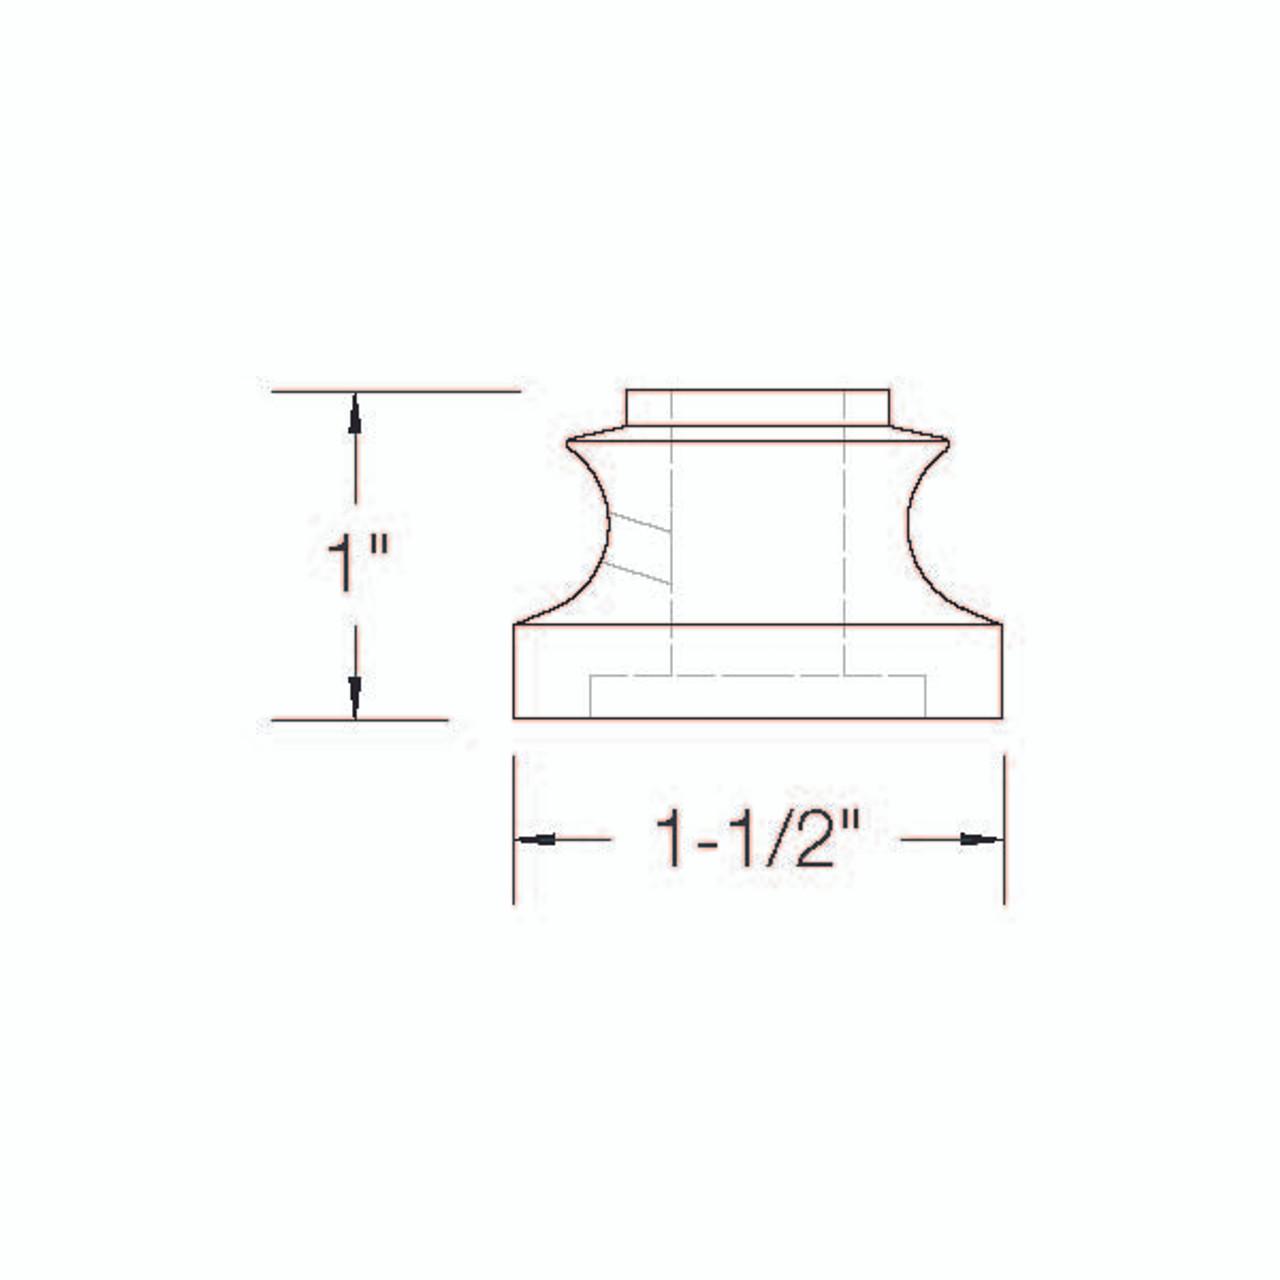 SD500R Flat Shoe Dimensional Information